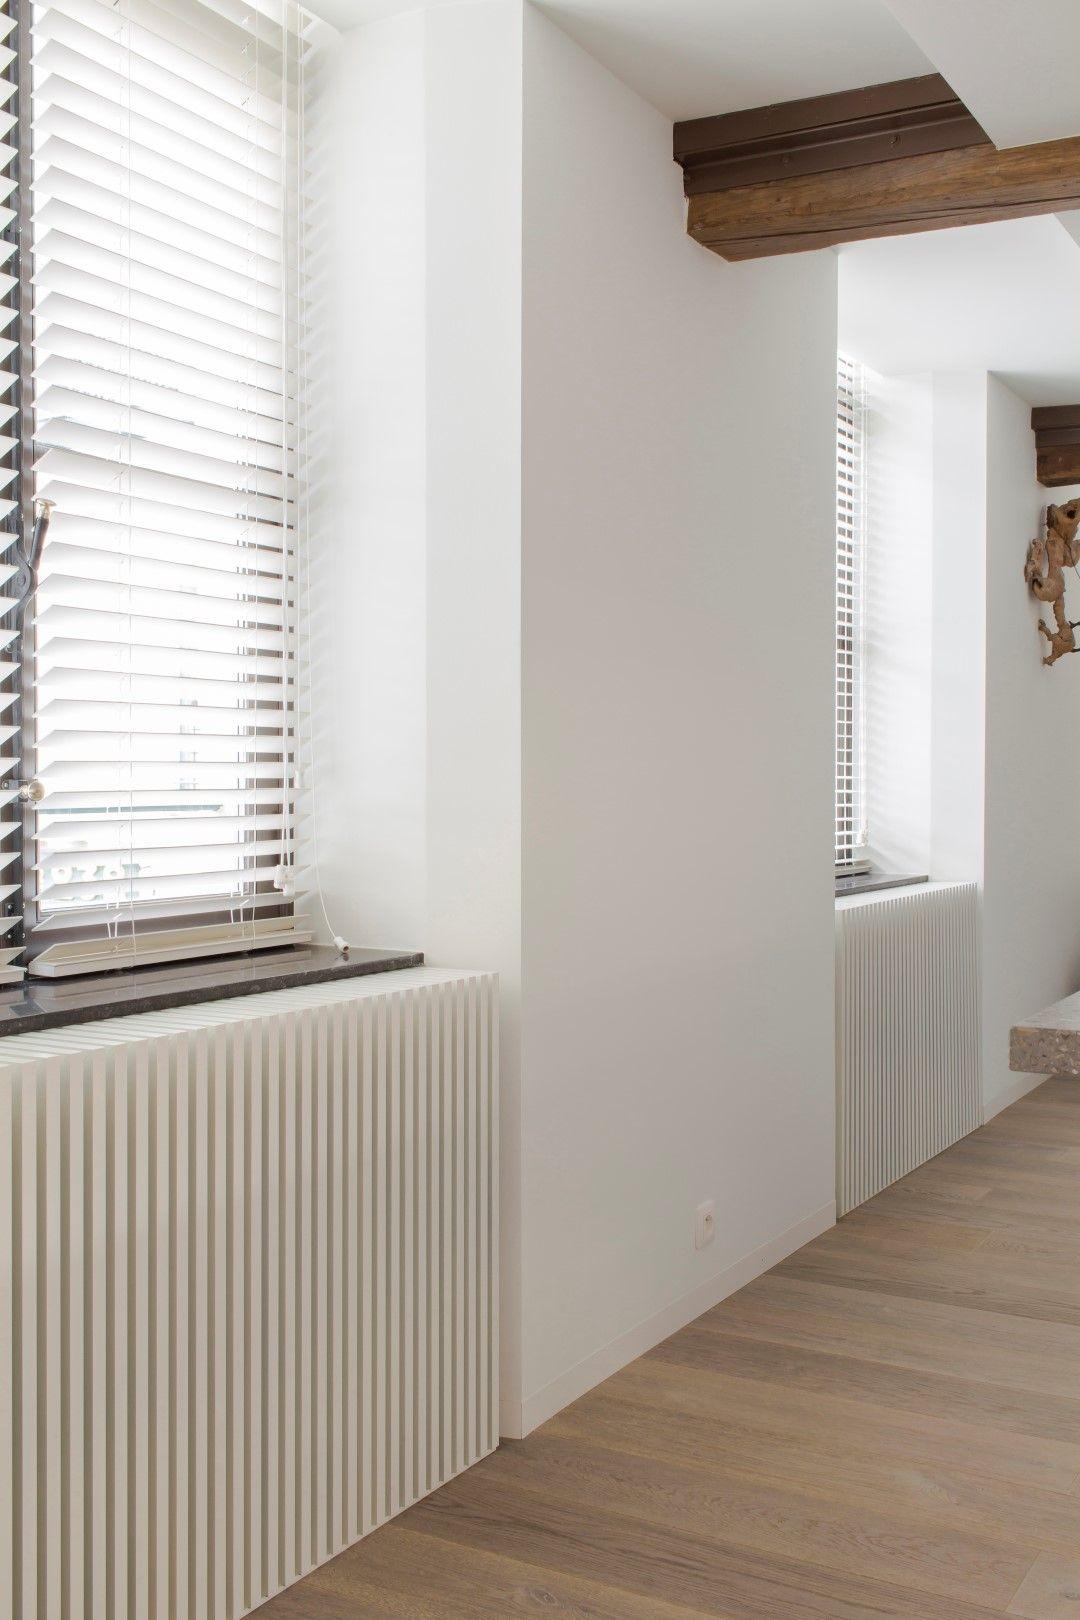 iXtra | Living | iXtra | iXtra interieur architect | Pinterest ...